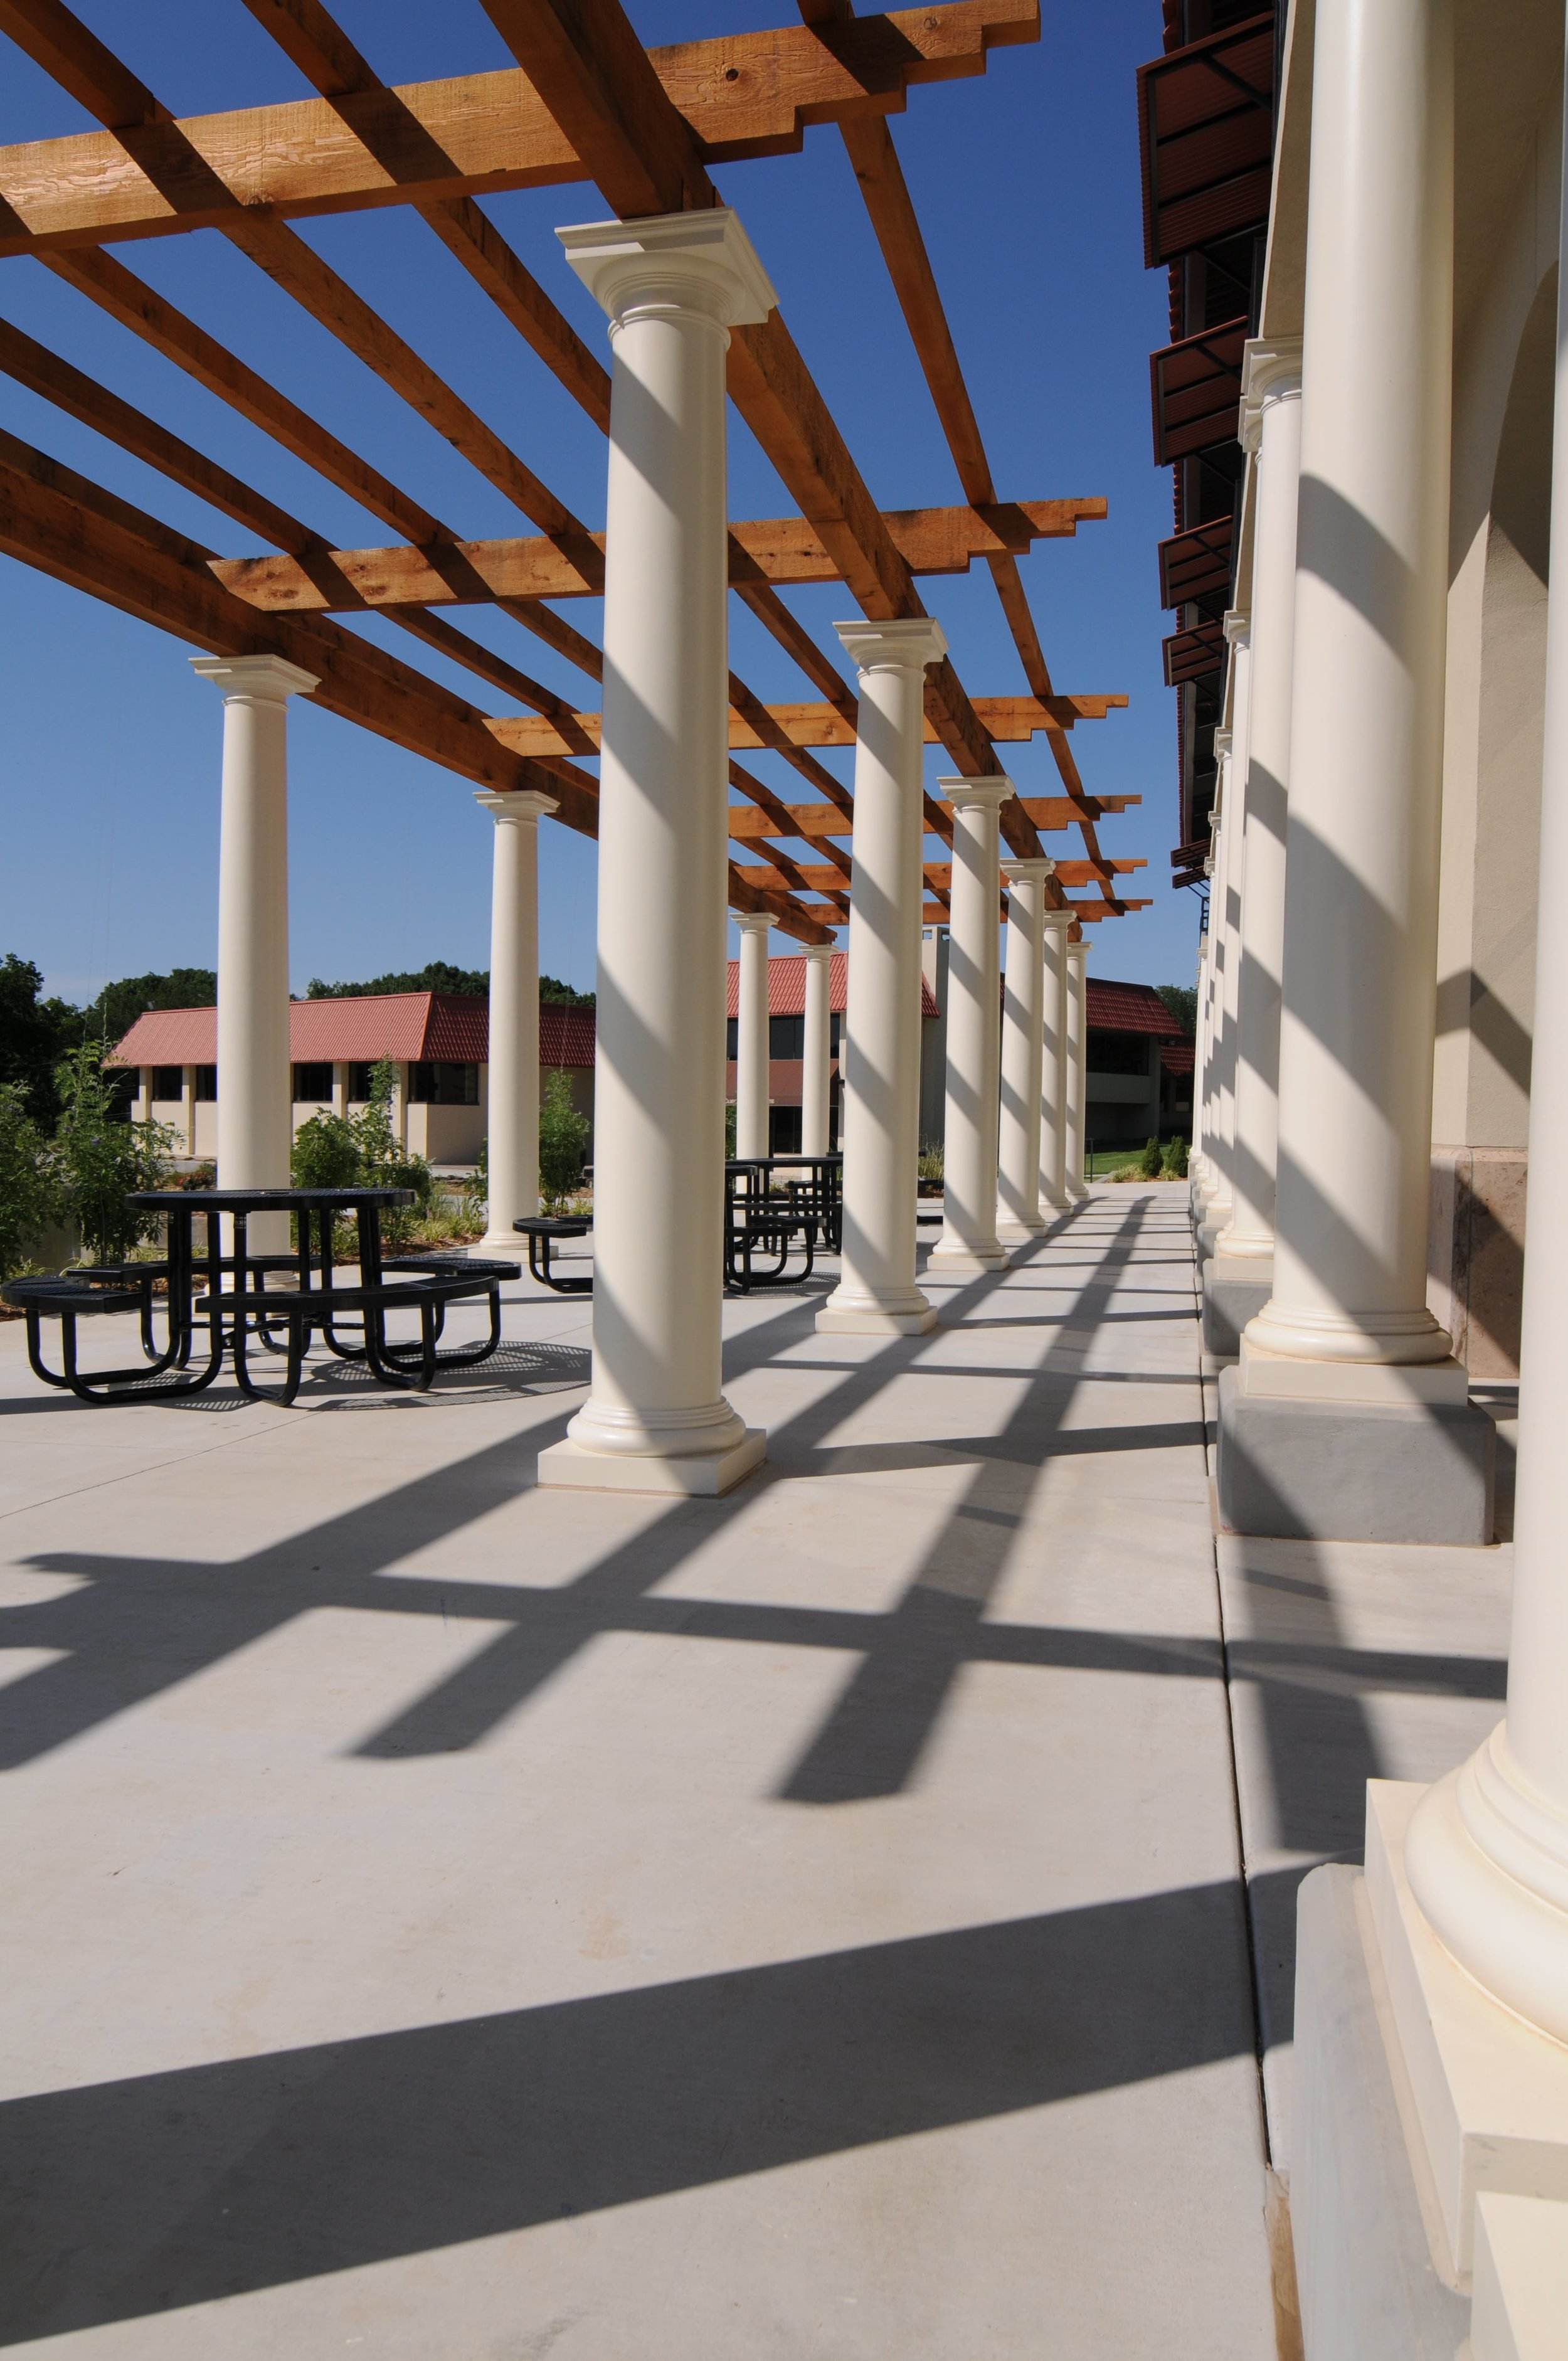 AA - OklahomaWesleyanUniversityLibrary -  (151)-min.JPG